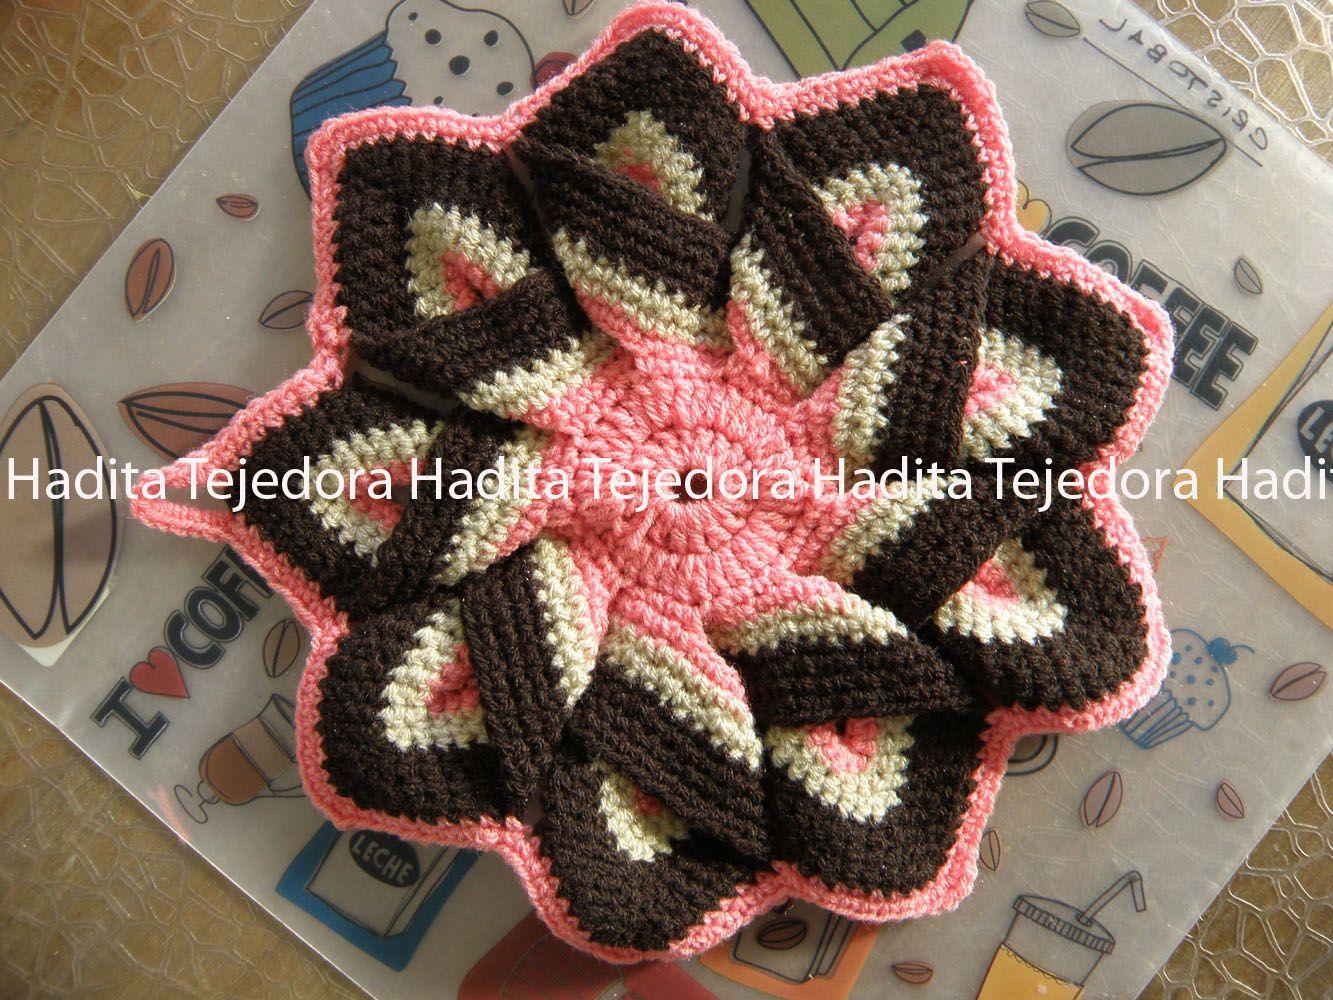 crochet | Agarraderas - Crochet - Tejidos de Punto - 14211 | Crochet ...